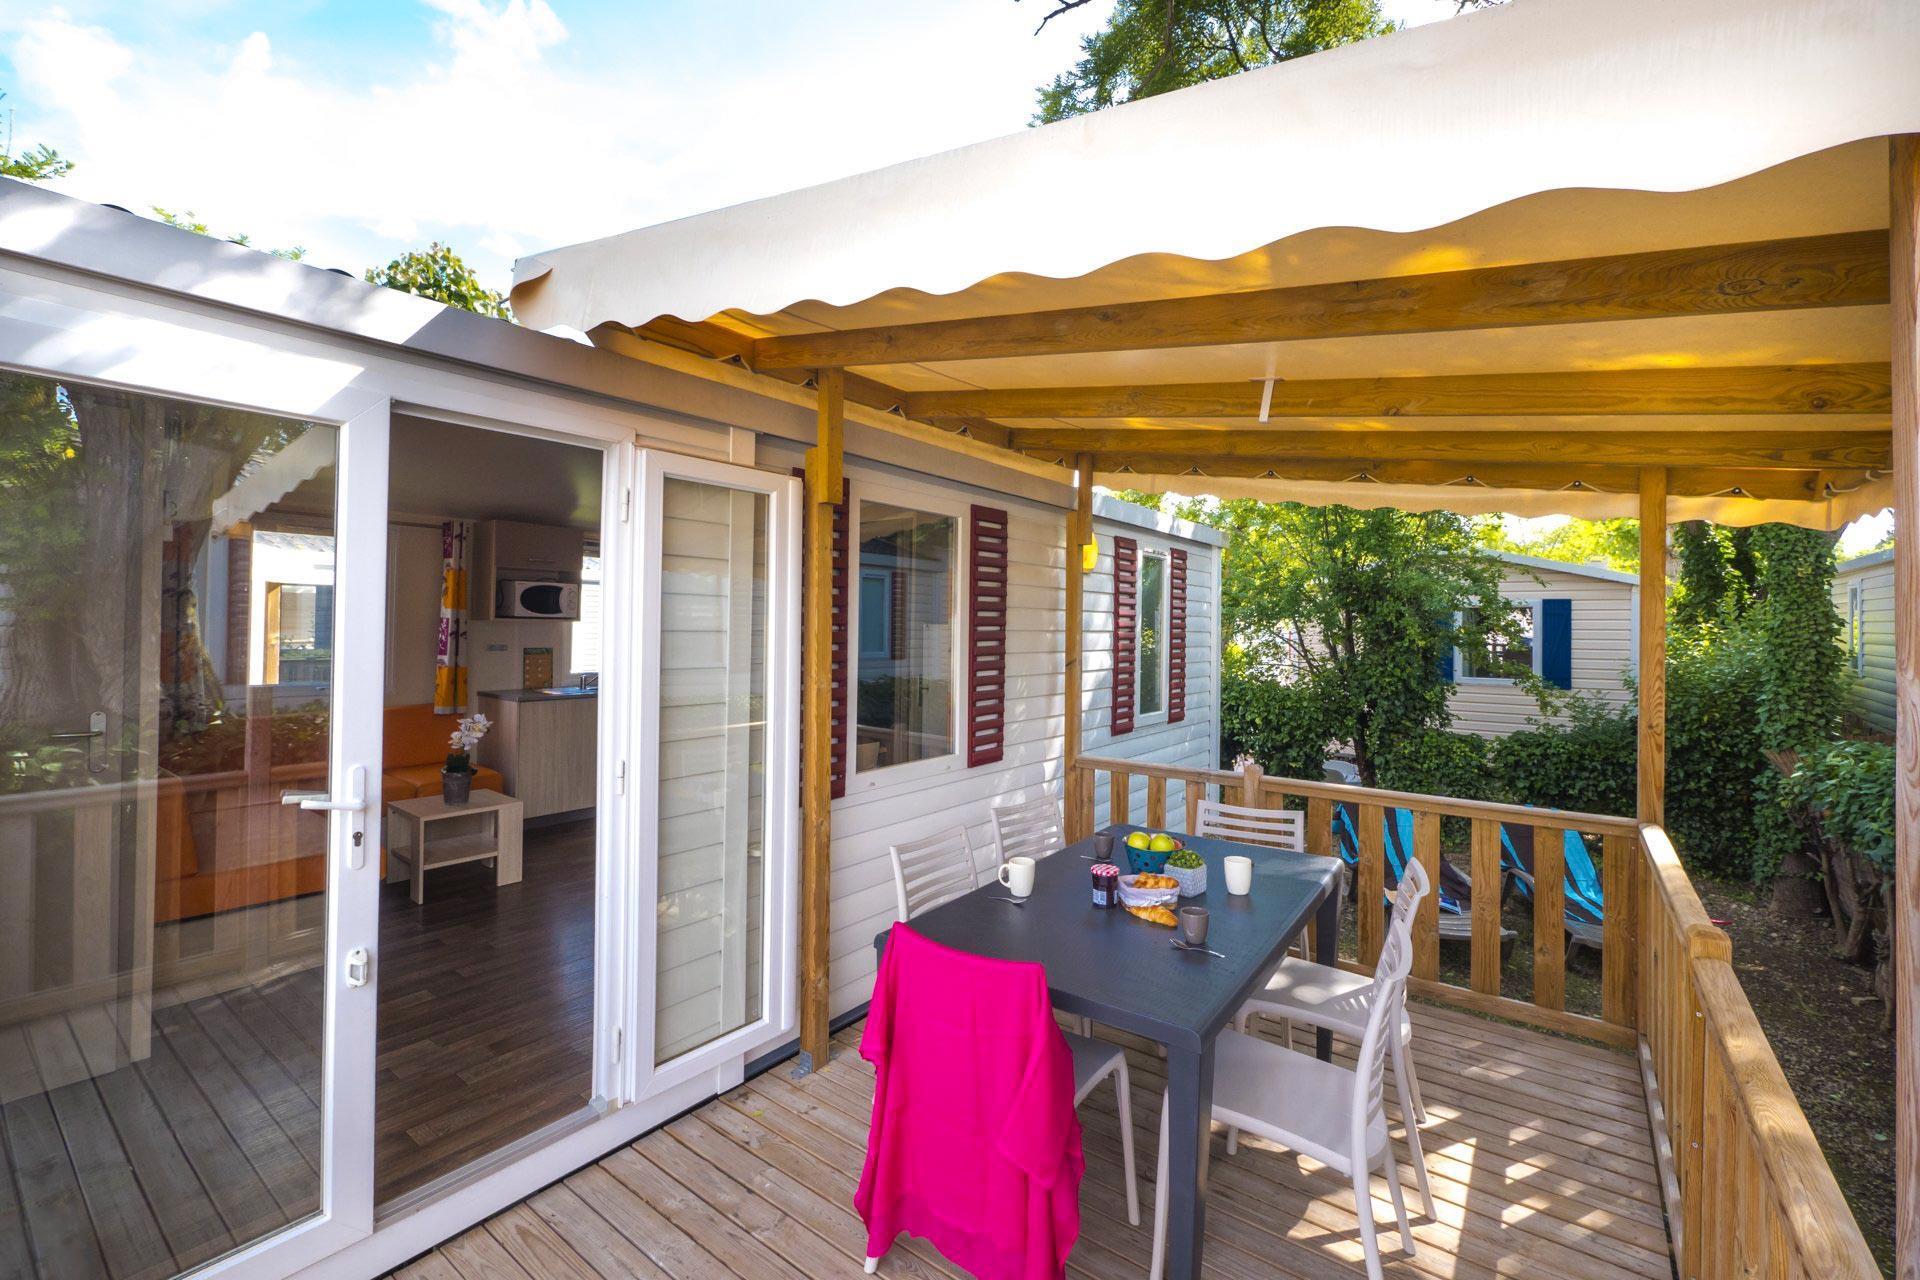 Location - Cottage 2 Chambres Climatisé *** 31M² - Camping Sandaya Riviera d'Azur